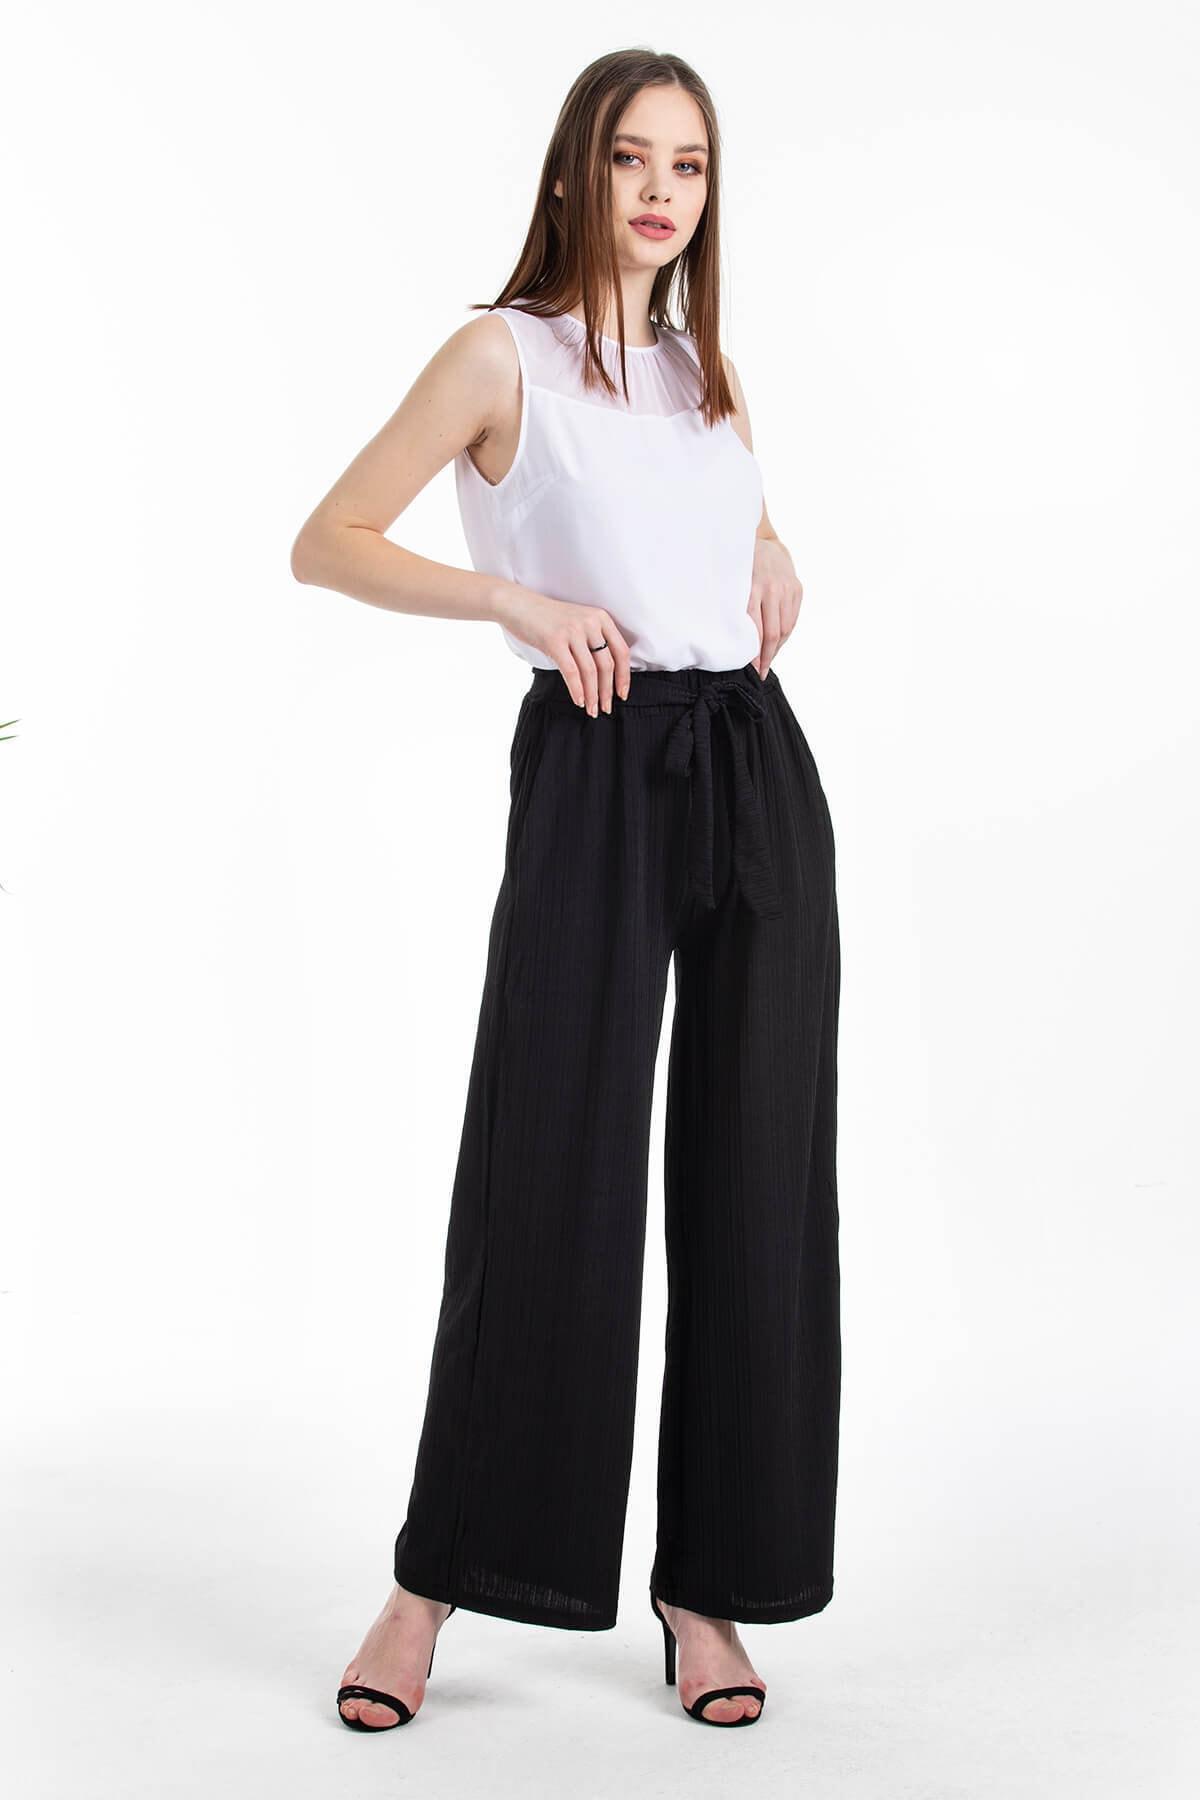 Mossta Kadın Siyah Likralı Kaşkorse Salaş Pantolon 1